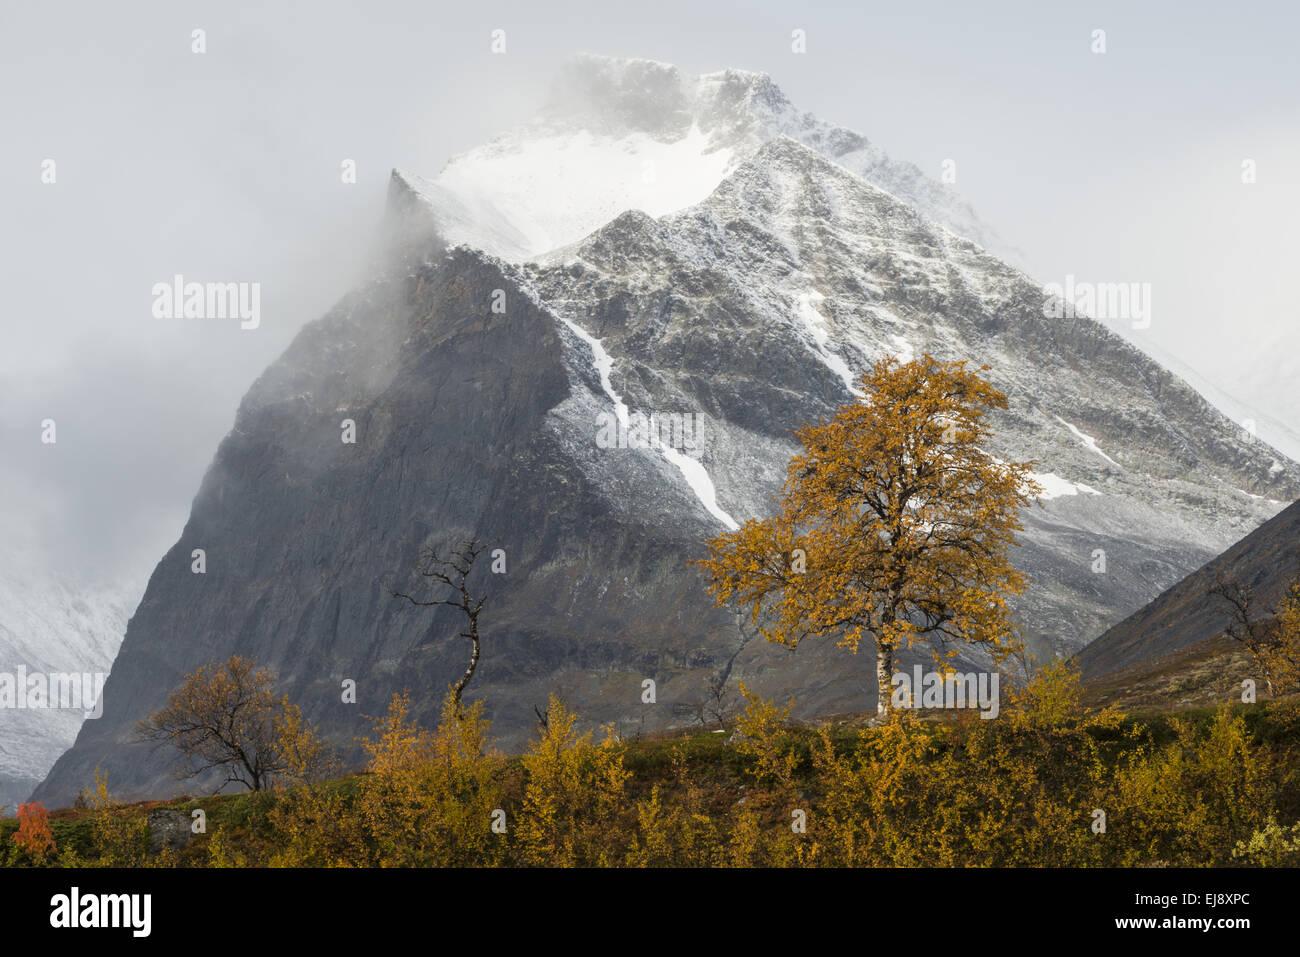 Mt. Duolbagorni, Kebnekaise mountains, Sweden - Stock Image